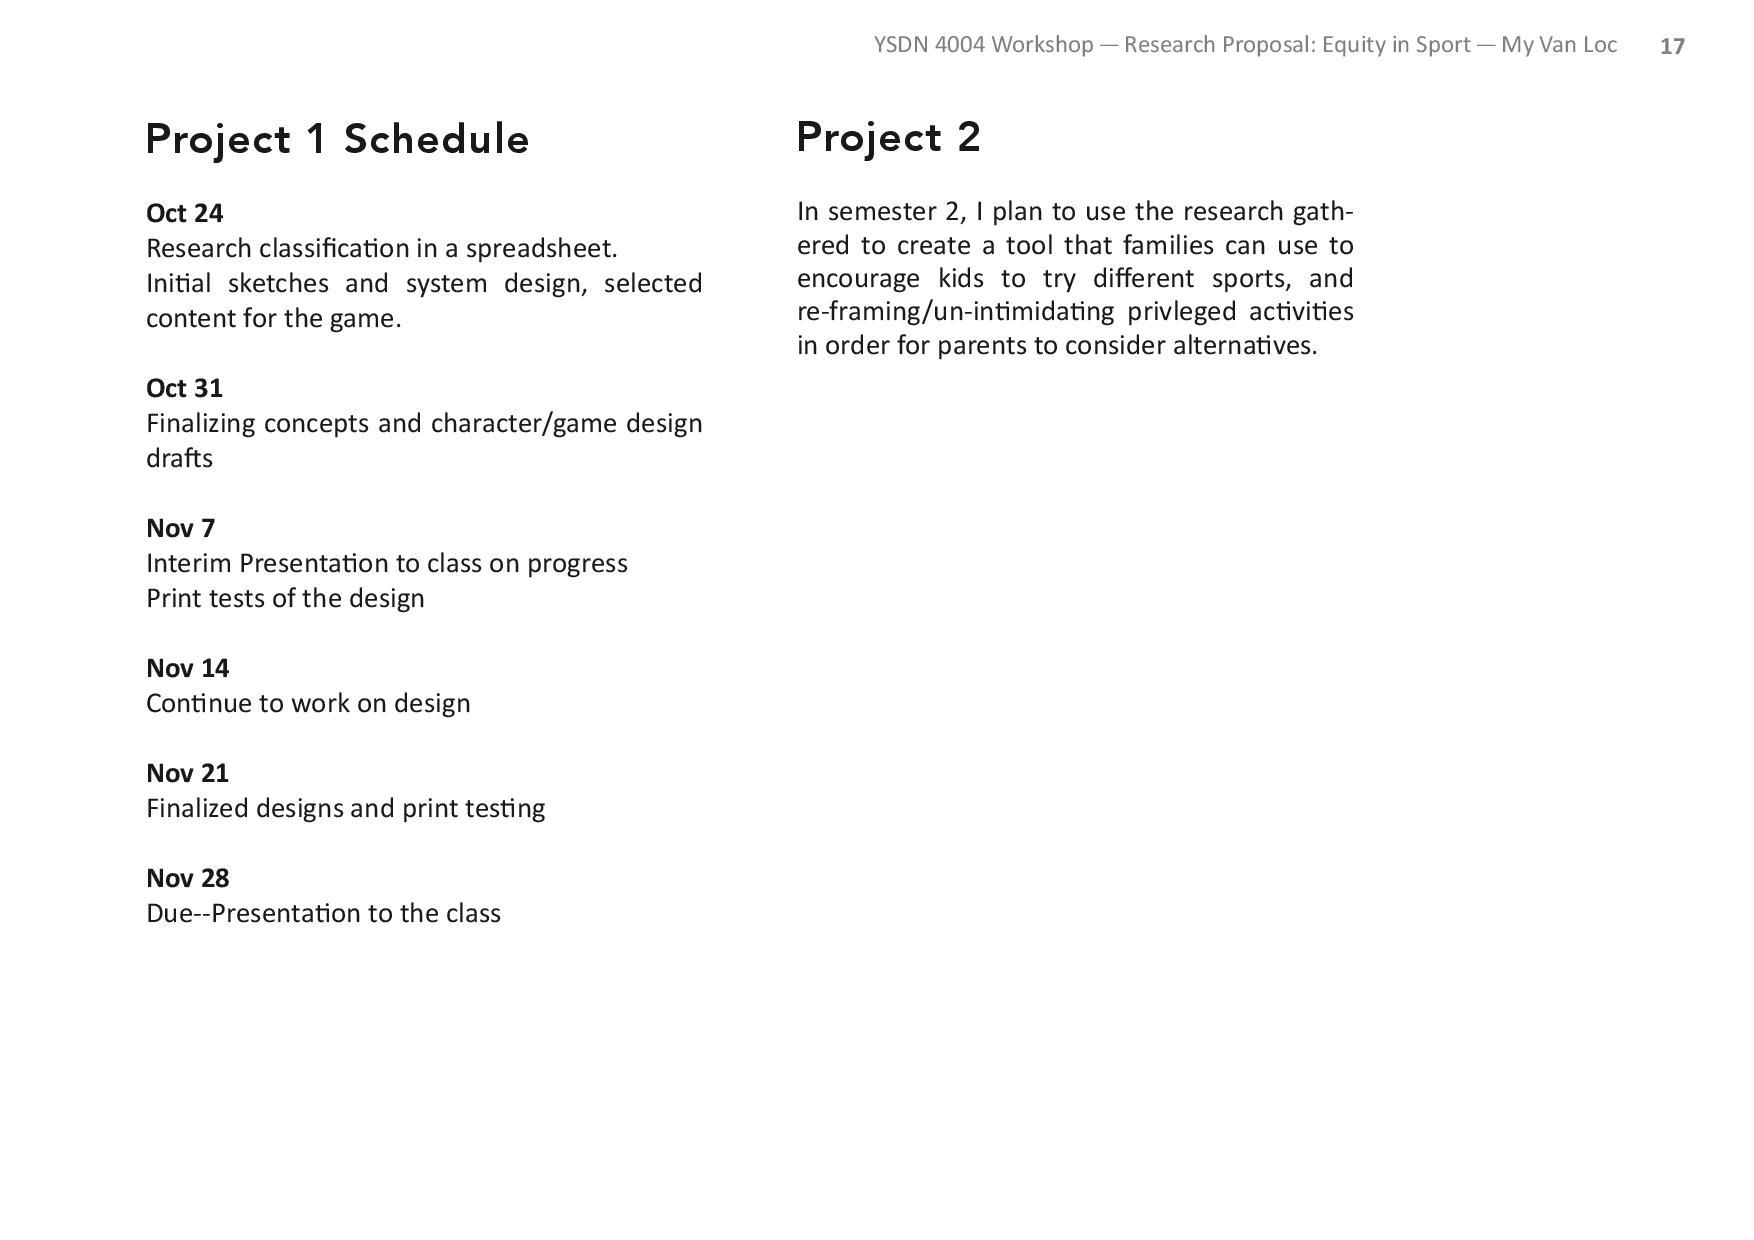 LocMy_ysdn4004_pr1_proposal-page-017.jpg